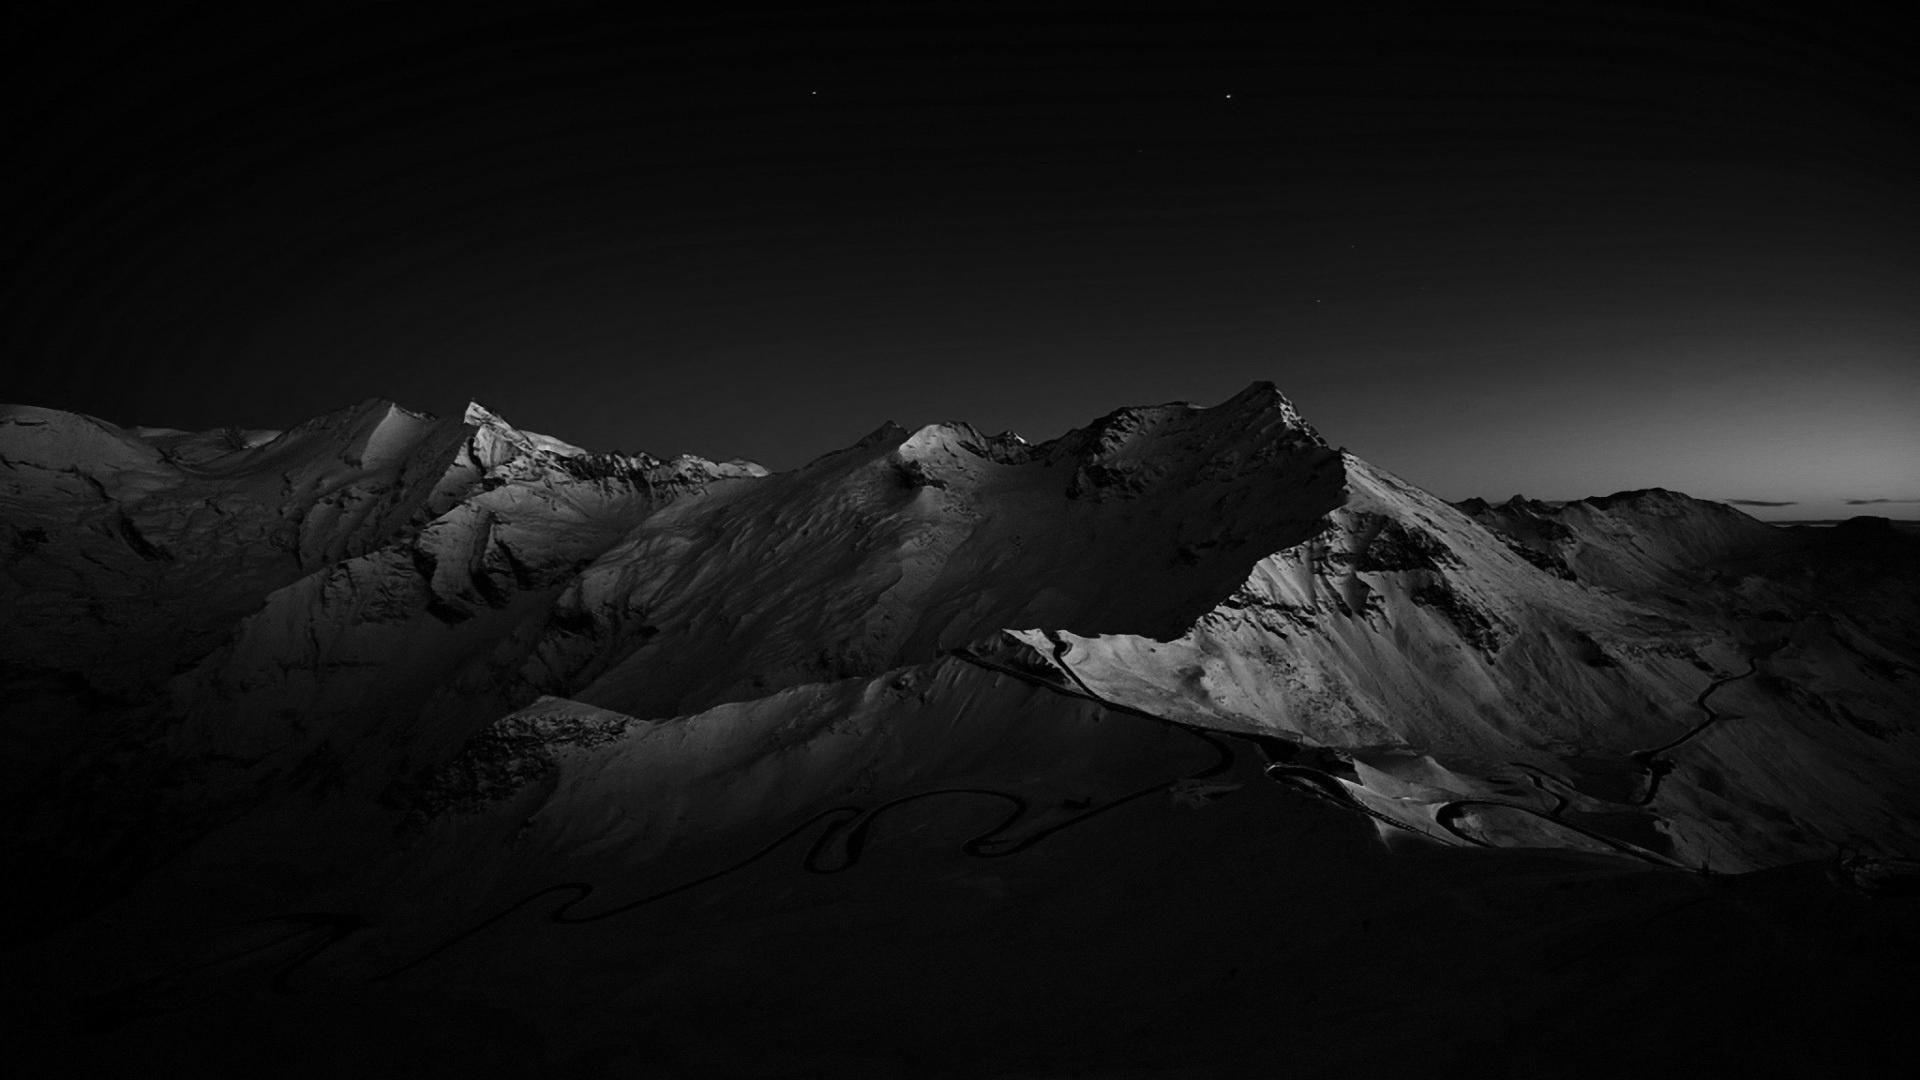 Dark Mountain Wallpaper and Background